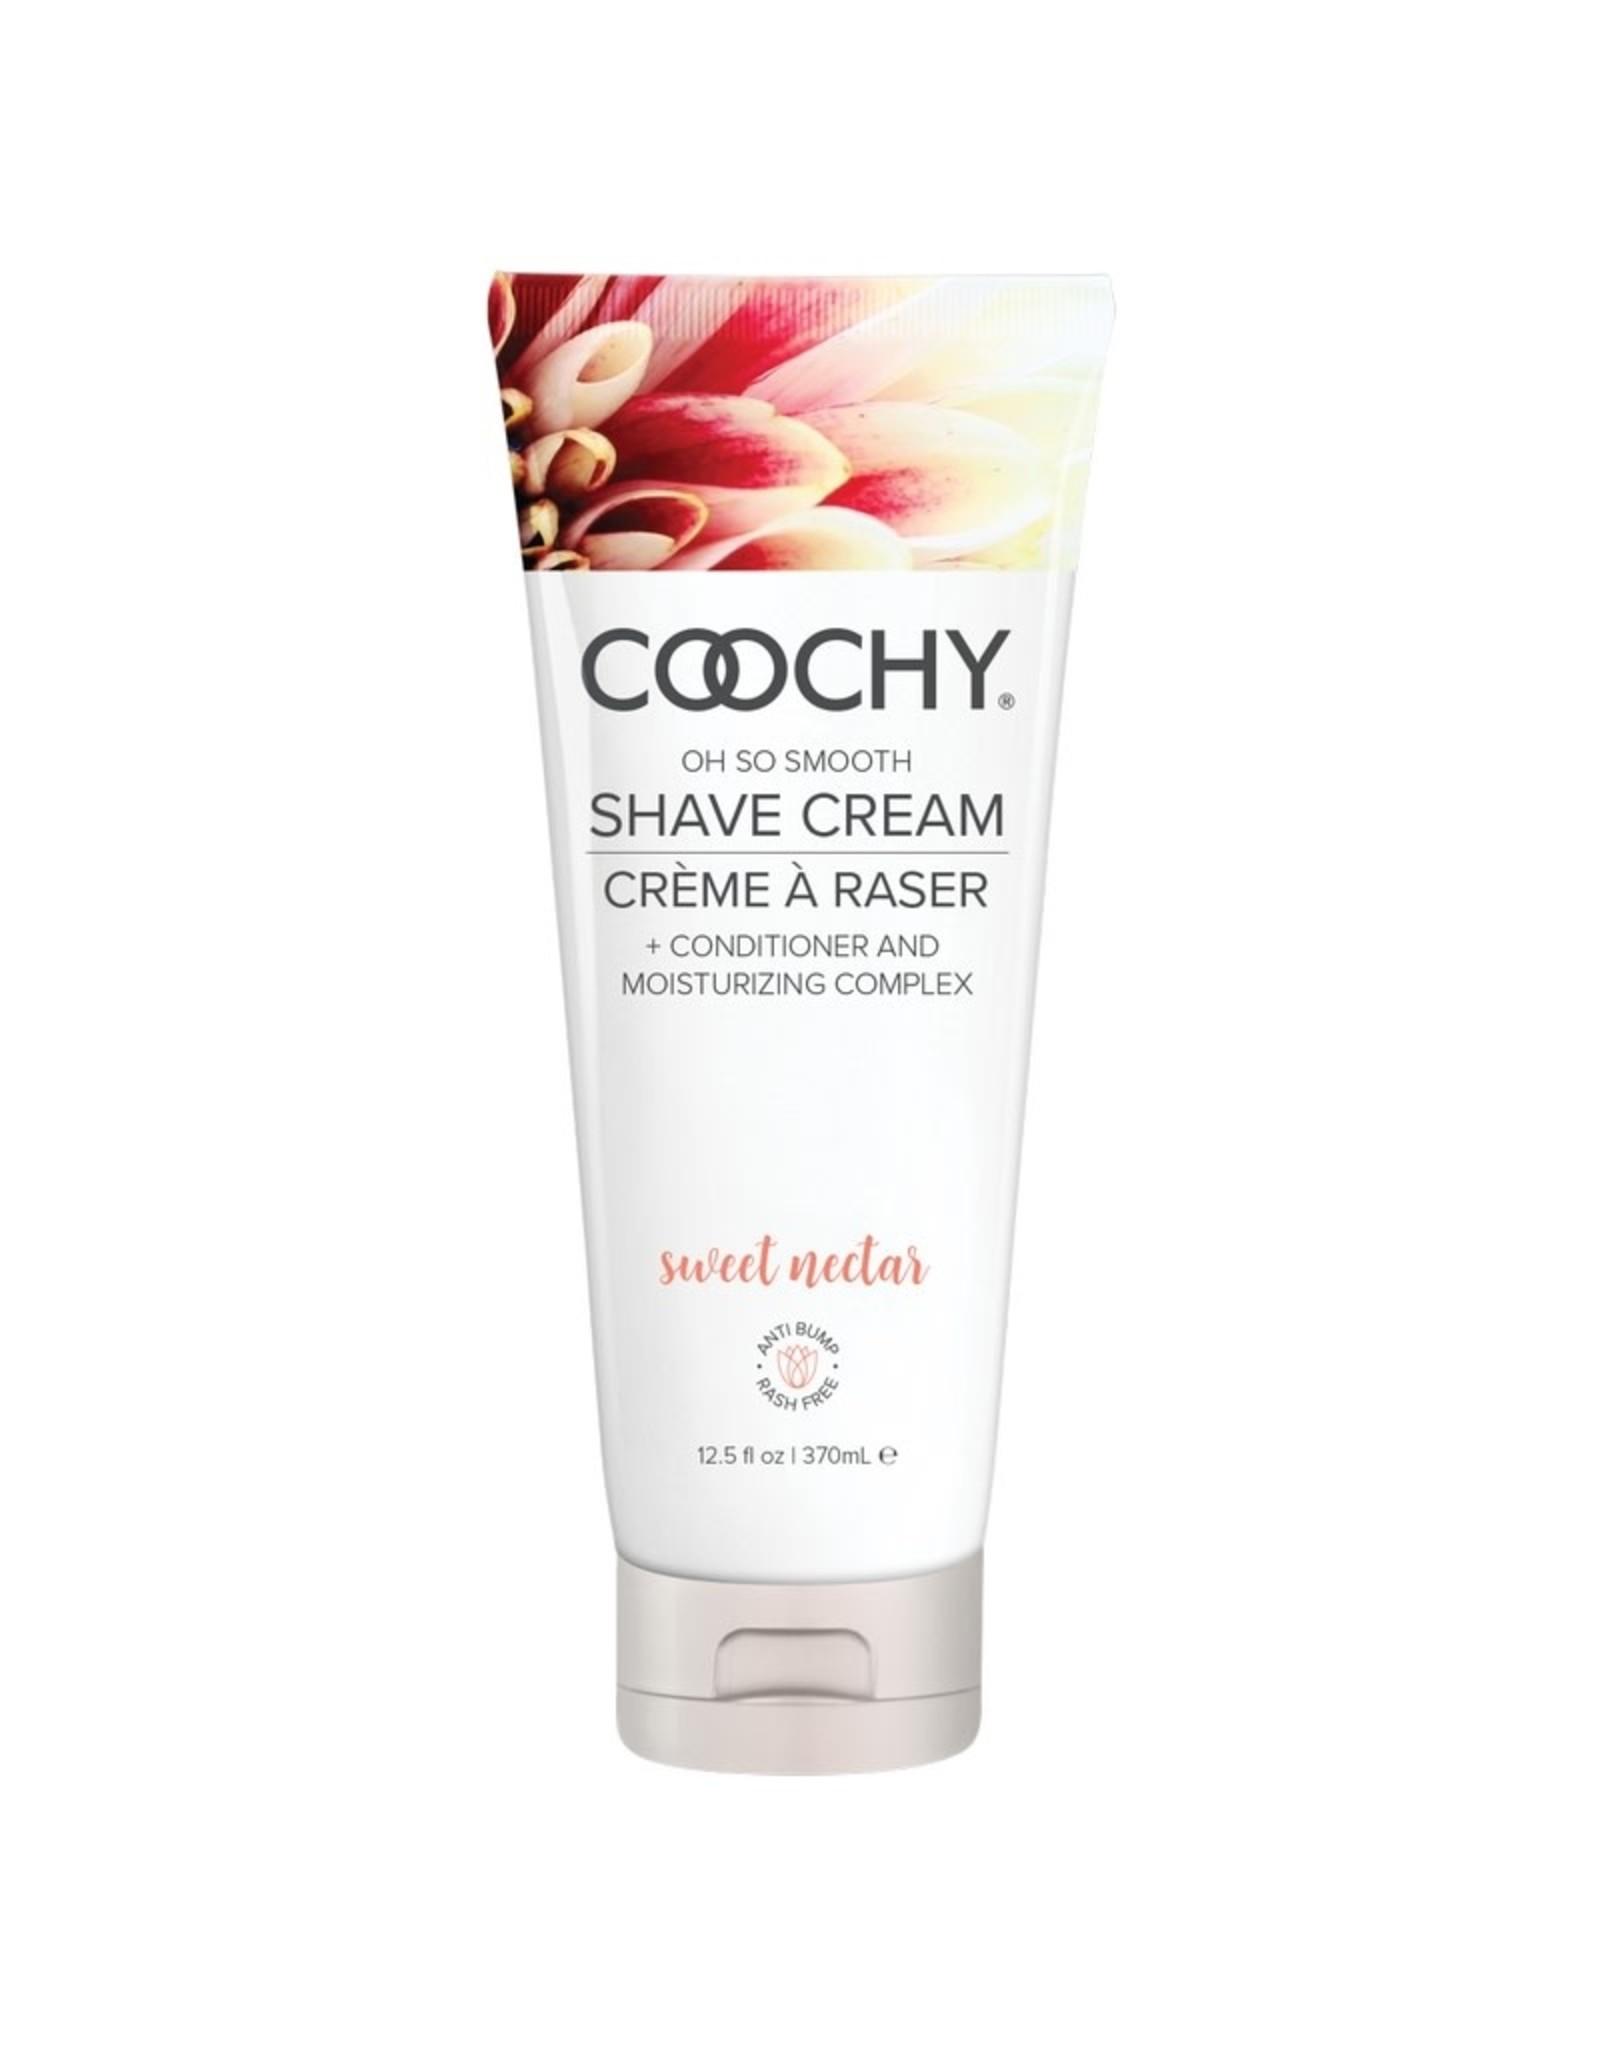 Classic Brands Coochy - Sweet Nectar - 12.5 oz